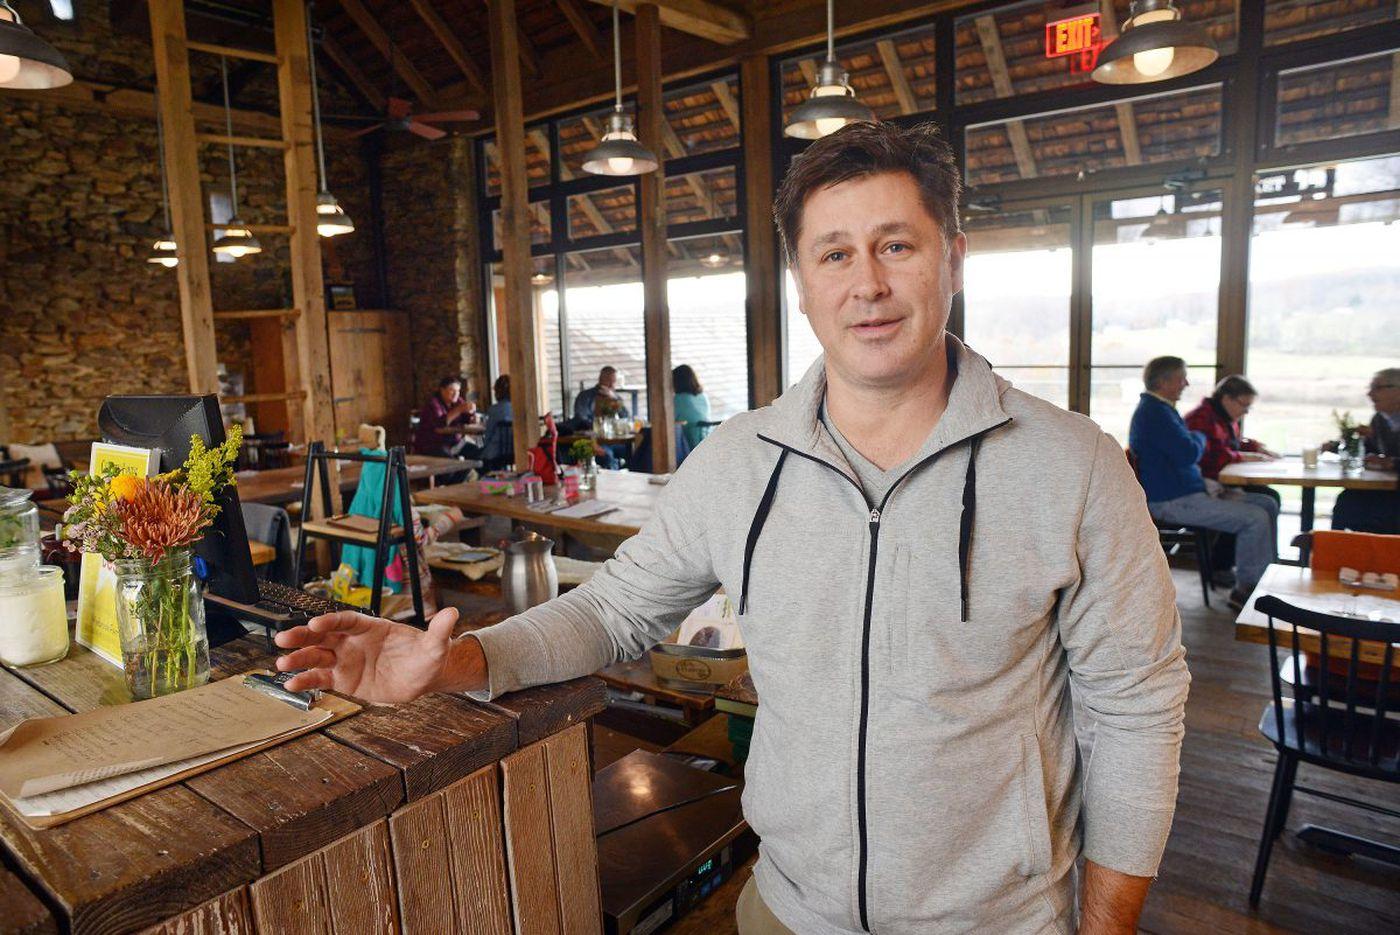 How red-tape morass closed Chesco farm's restaurant